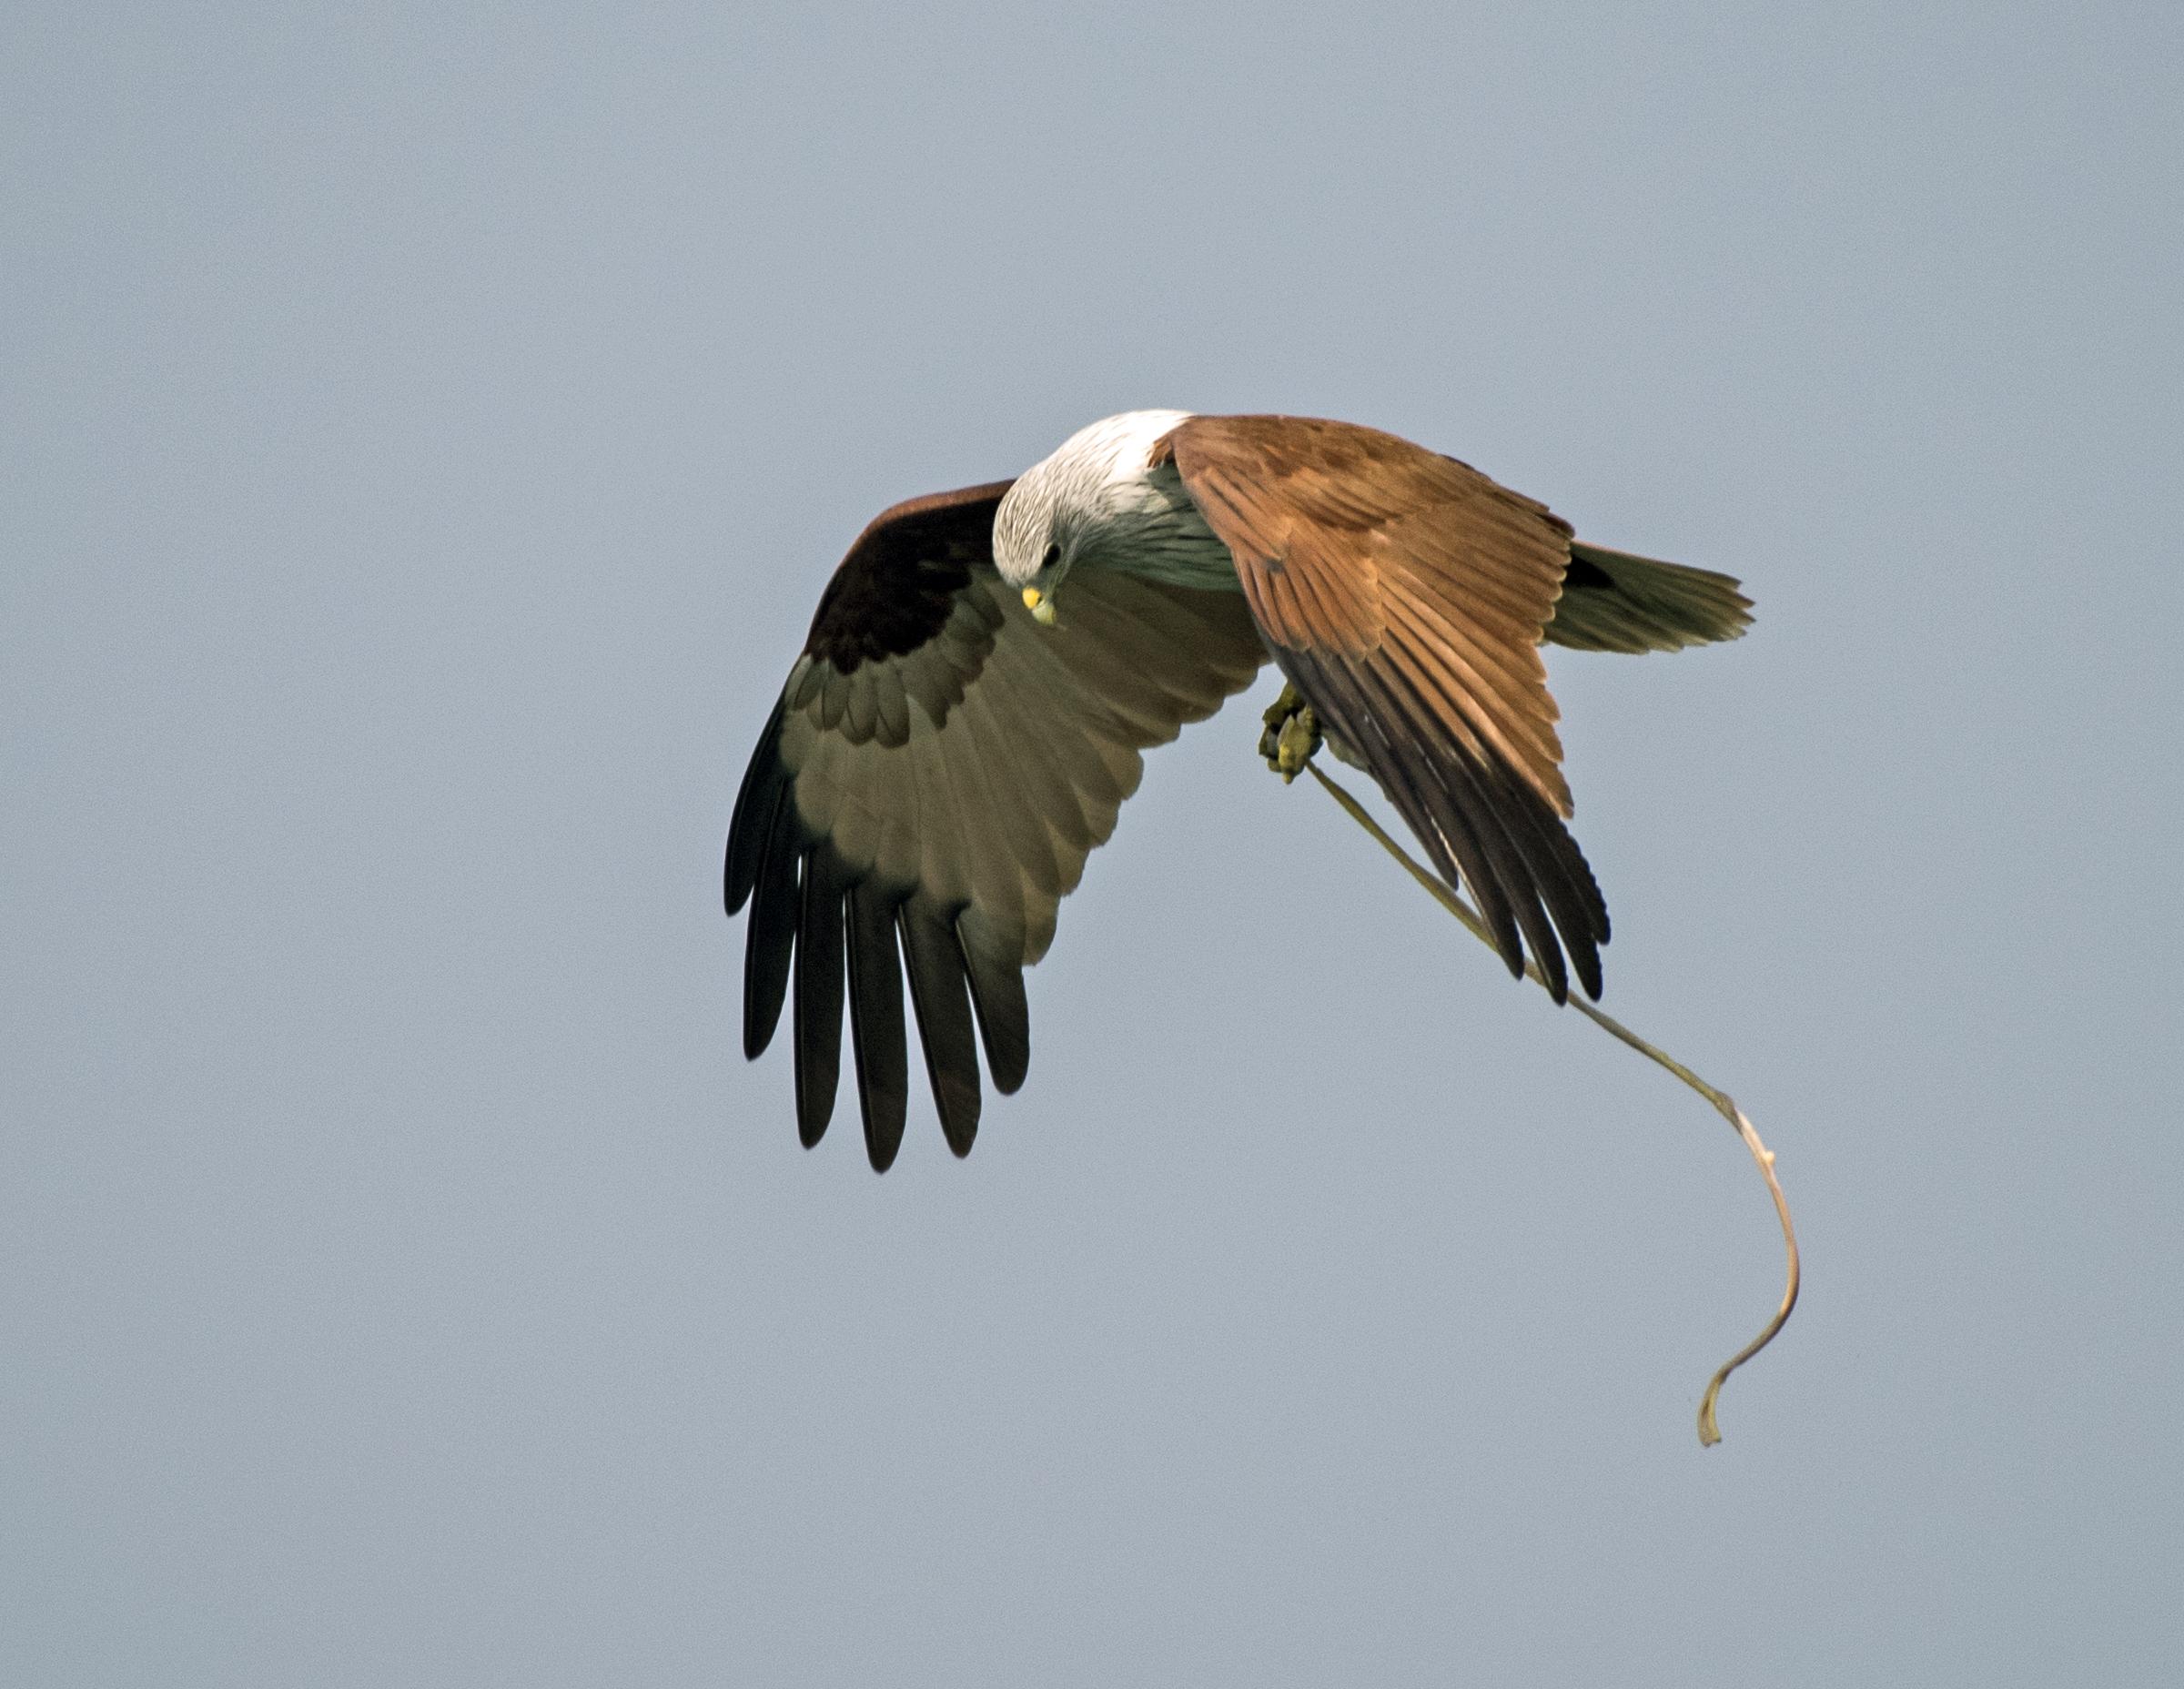 Brahminy Kite with a Catch